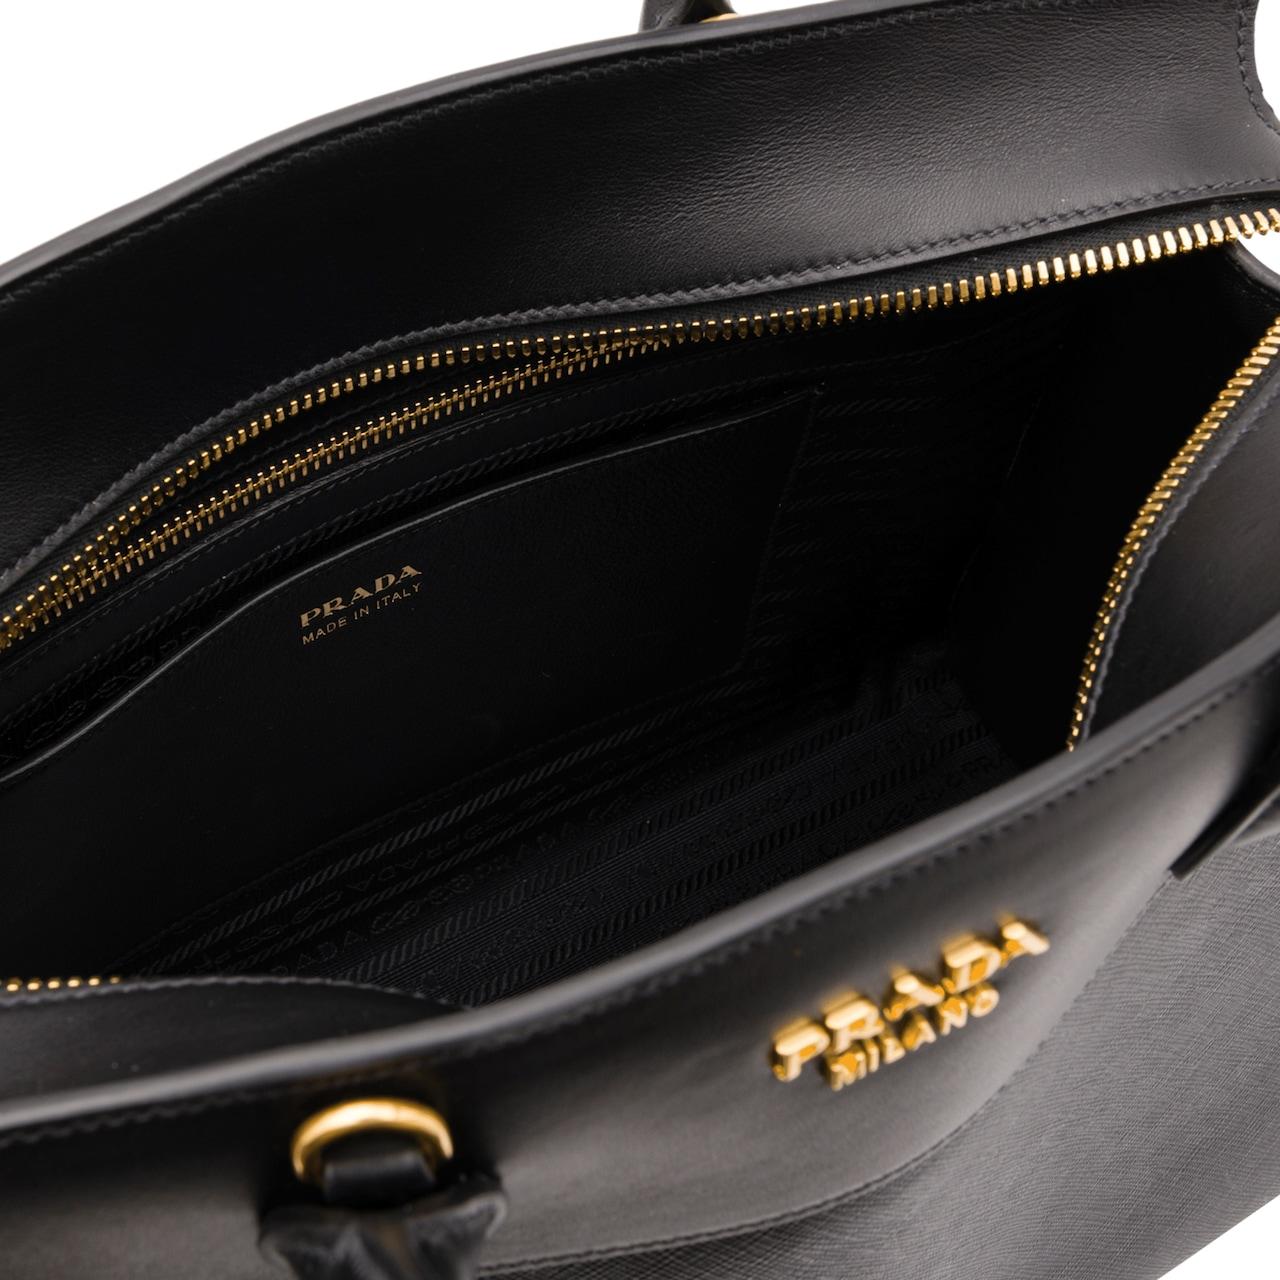 Esplanade leather bag